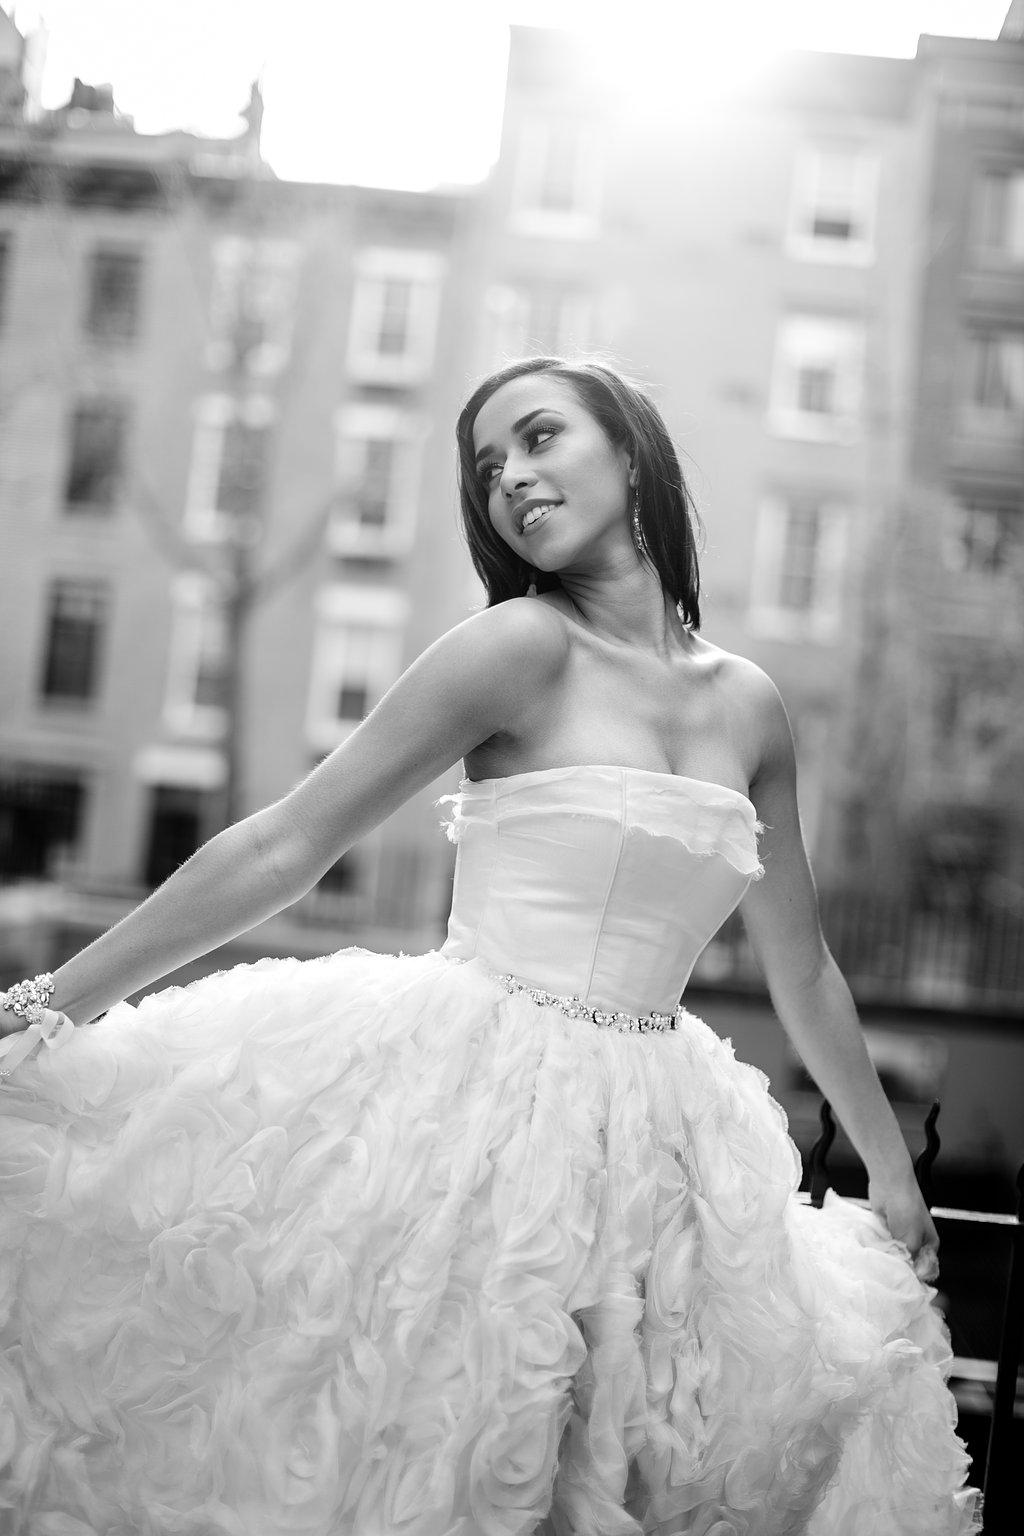 NYC_Highline_Hotel_Bridal_Shoot_PetronellaPhotography-63.jpg